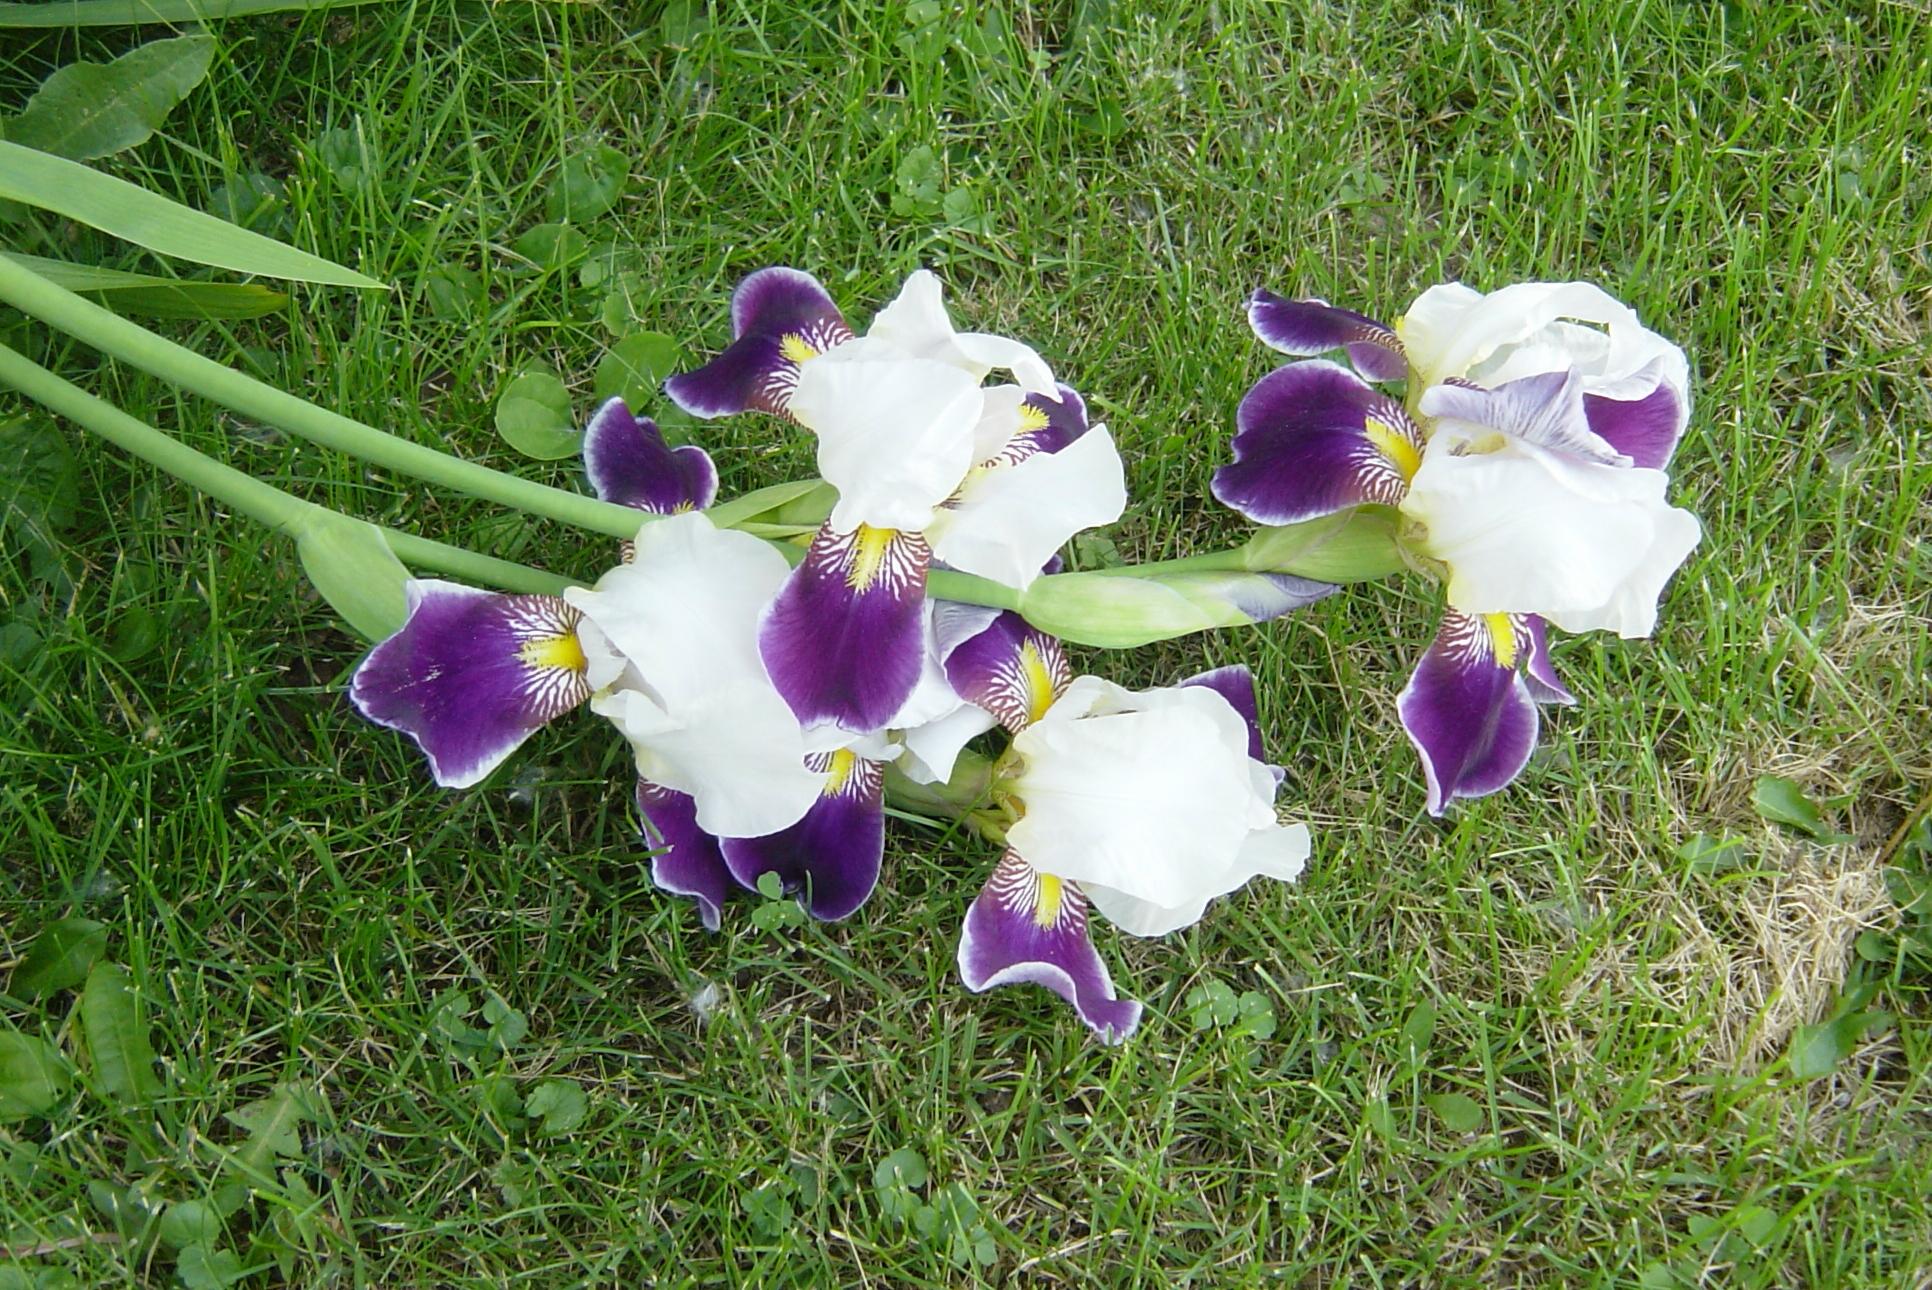 Blooming Purple Irises n Grass